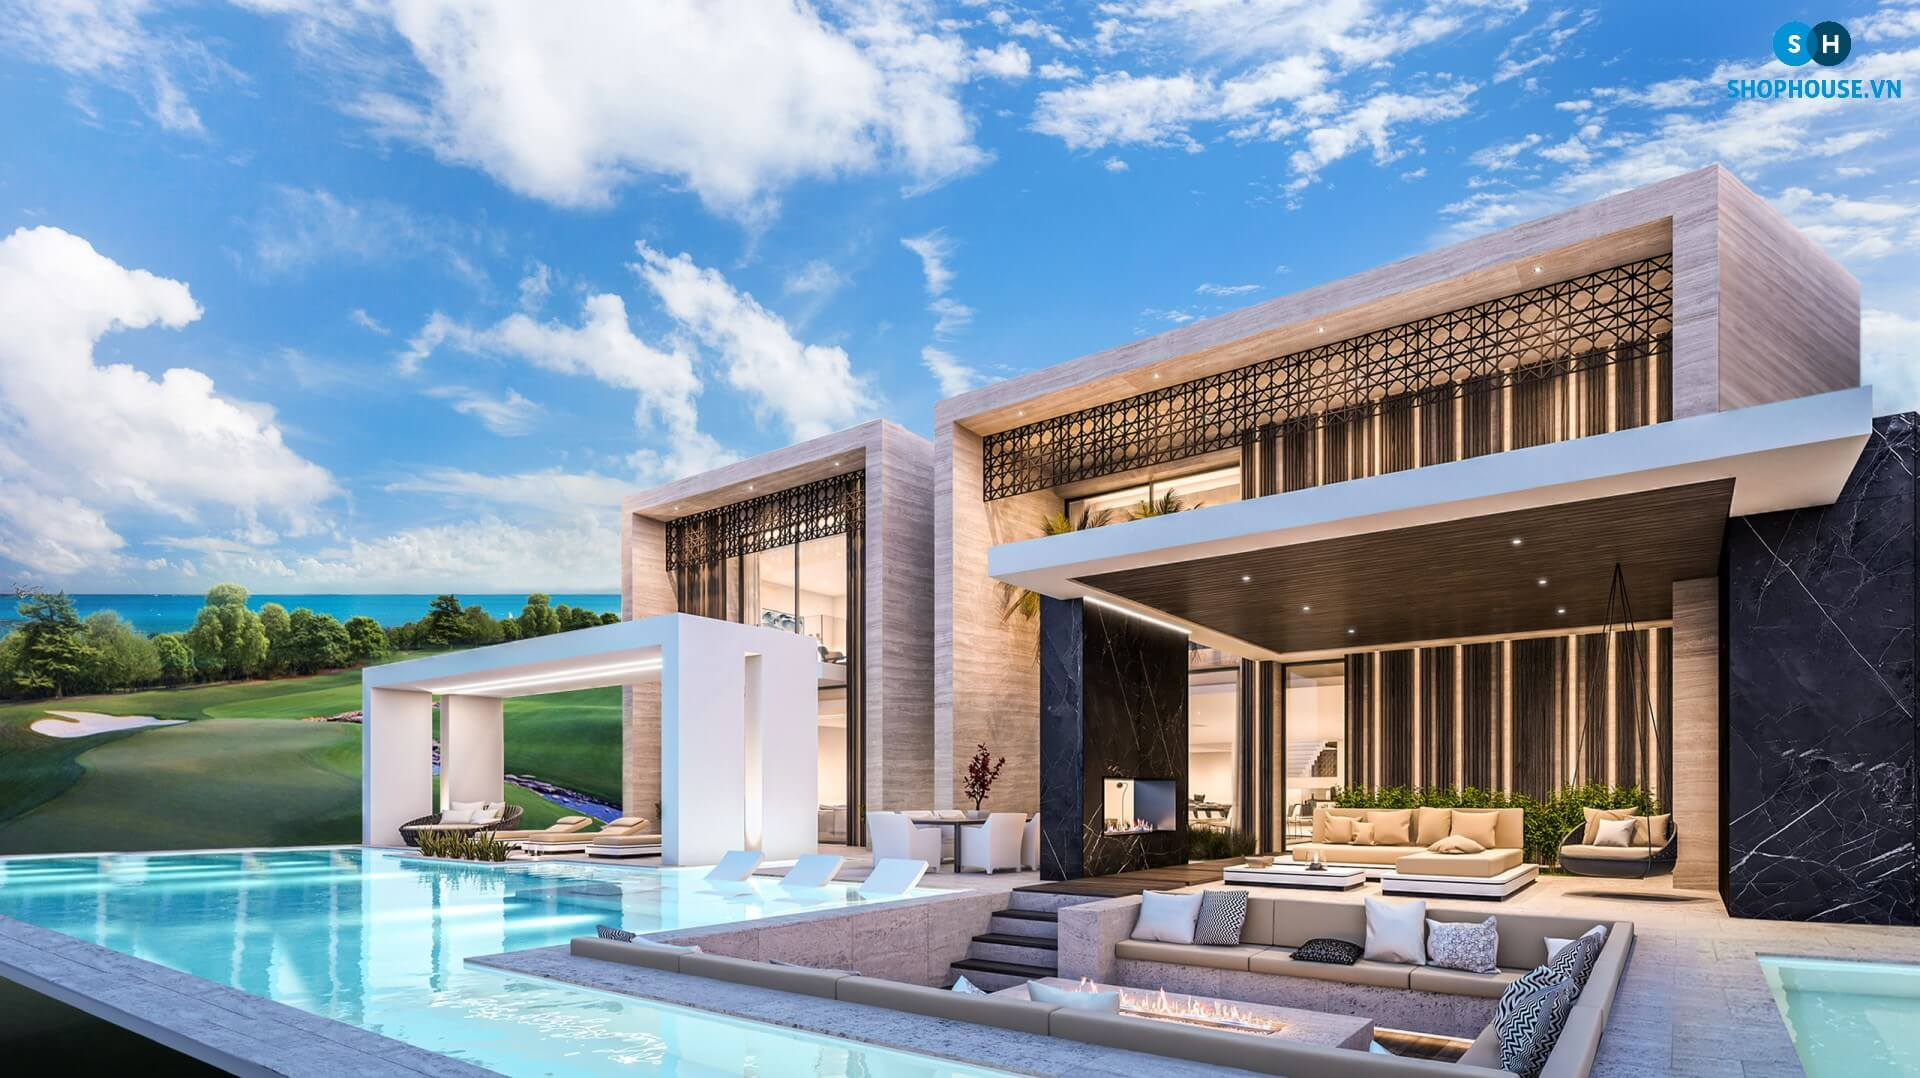 nha-pho-town-house-villas-golf-novaworld-phan-thiet-san-pga-doc-quyen-novaland